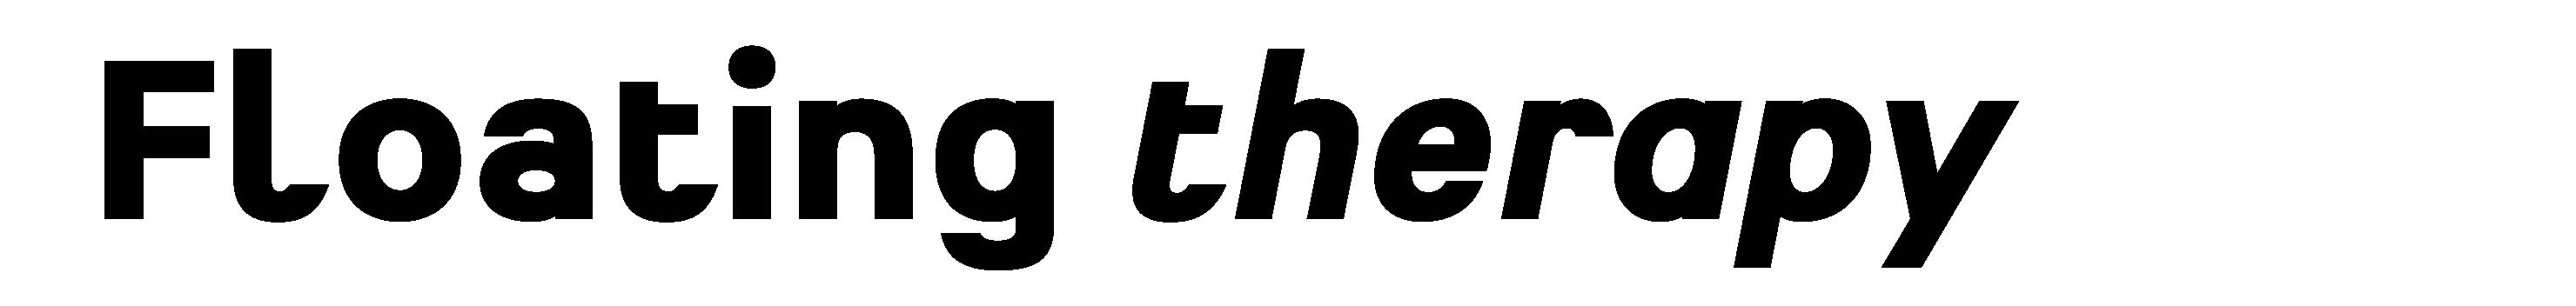 Typeface Heimat Sans D12 Atlas Font Foundry